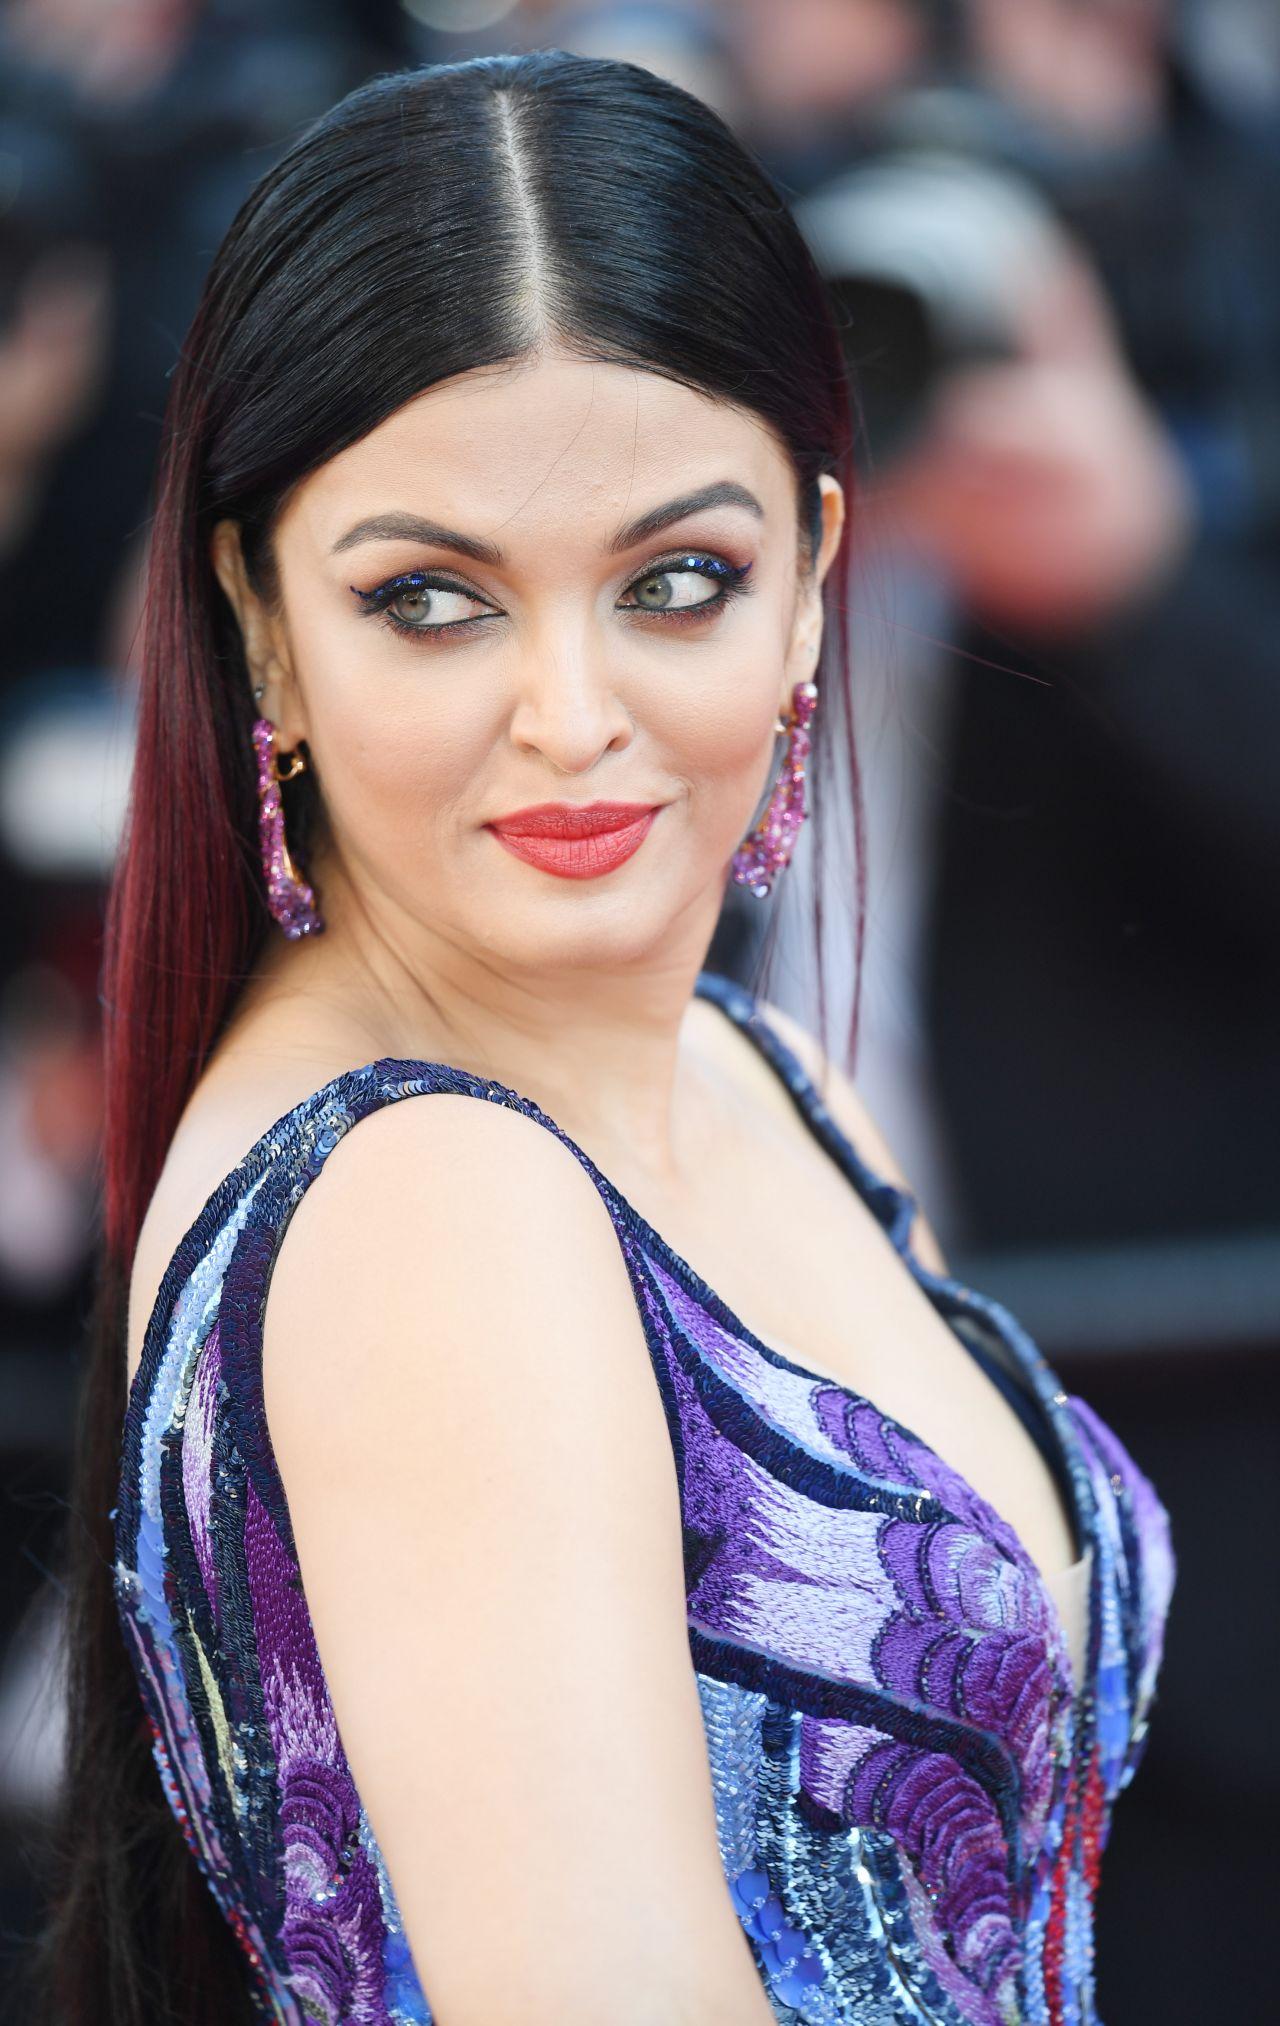 aishwarya rai bachchan - photo #29